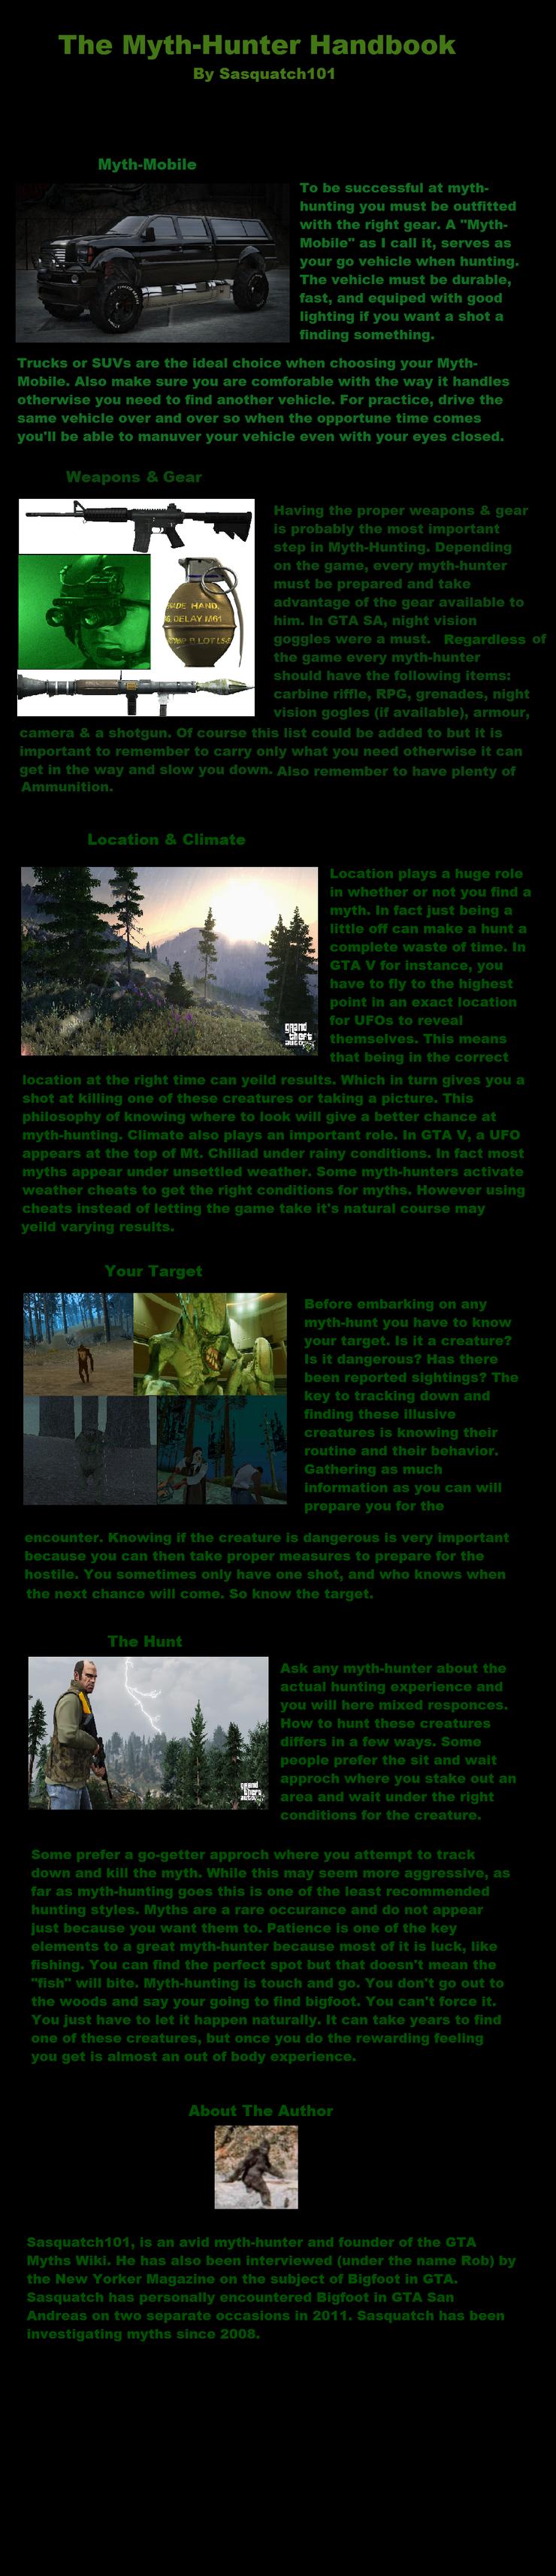 Mythhunter guide